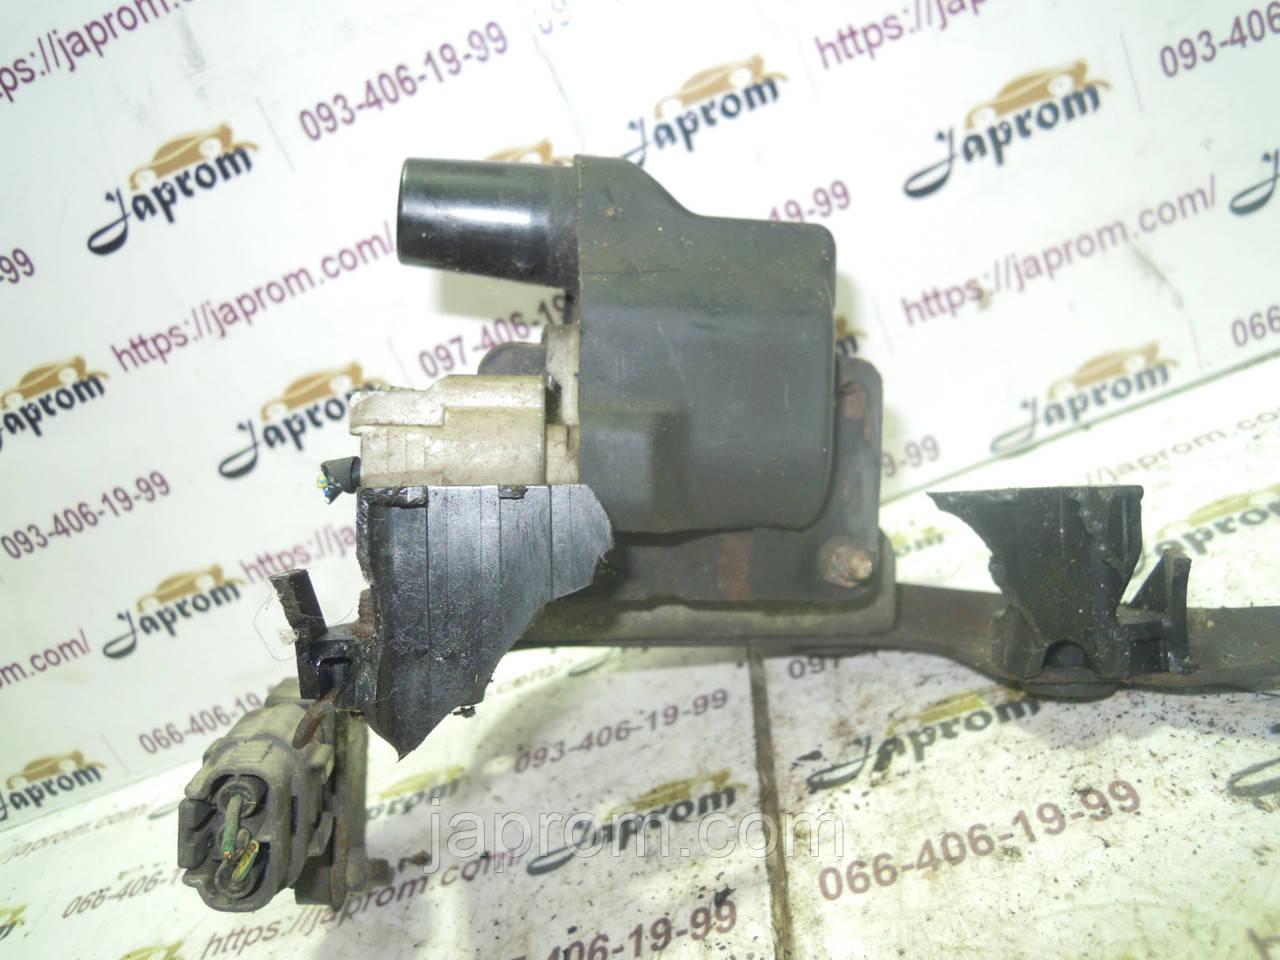 Катушка зажигания Mazda 323 BG 1988-1994 г.в. 1.3-1.8 бензин